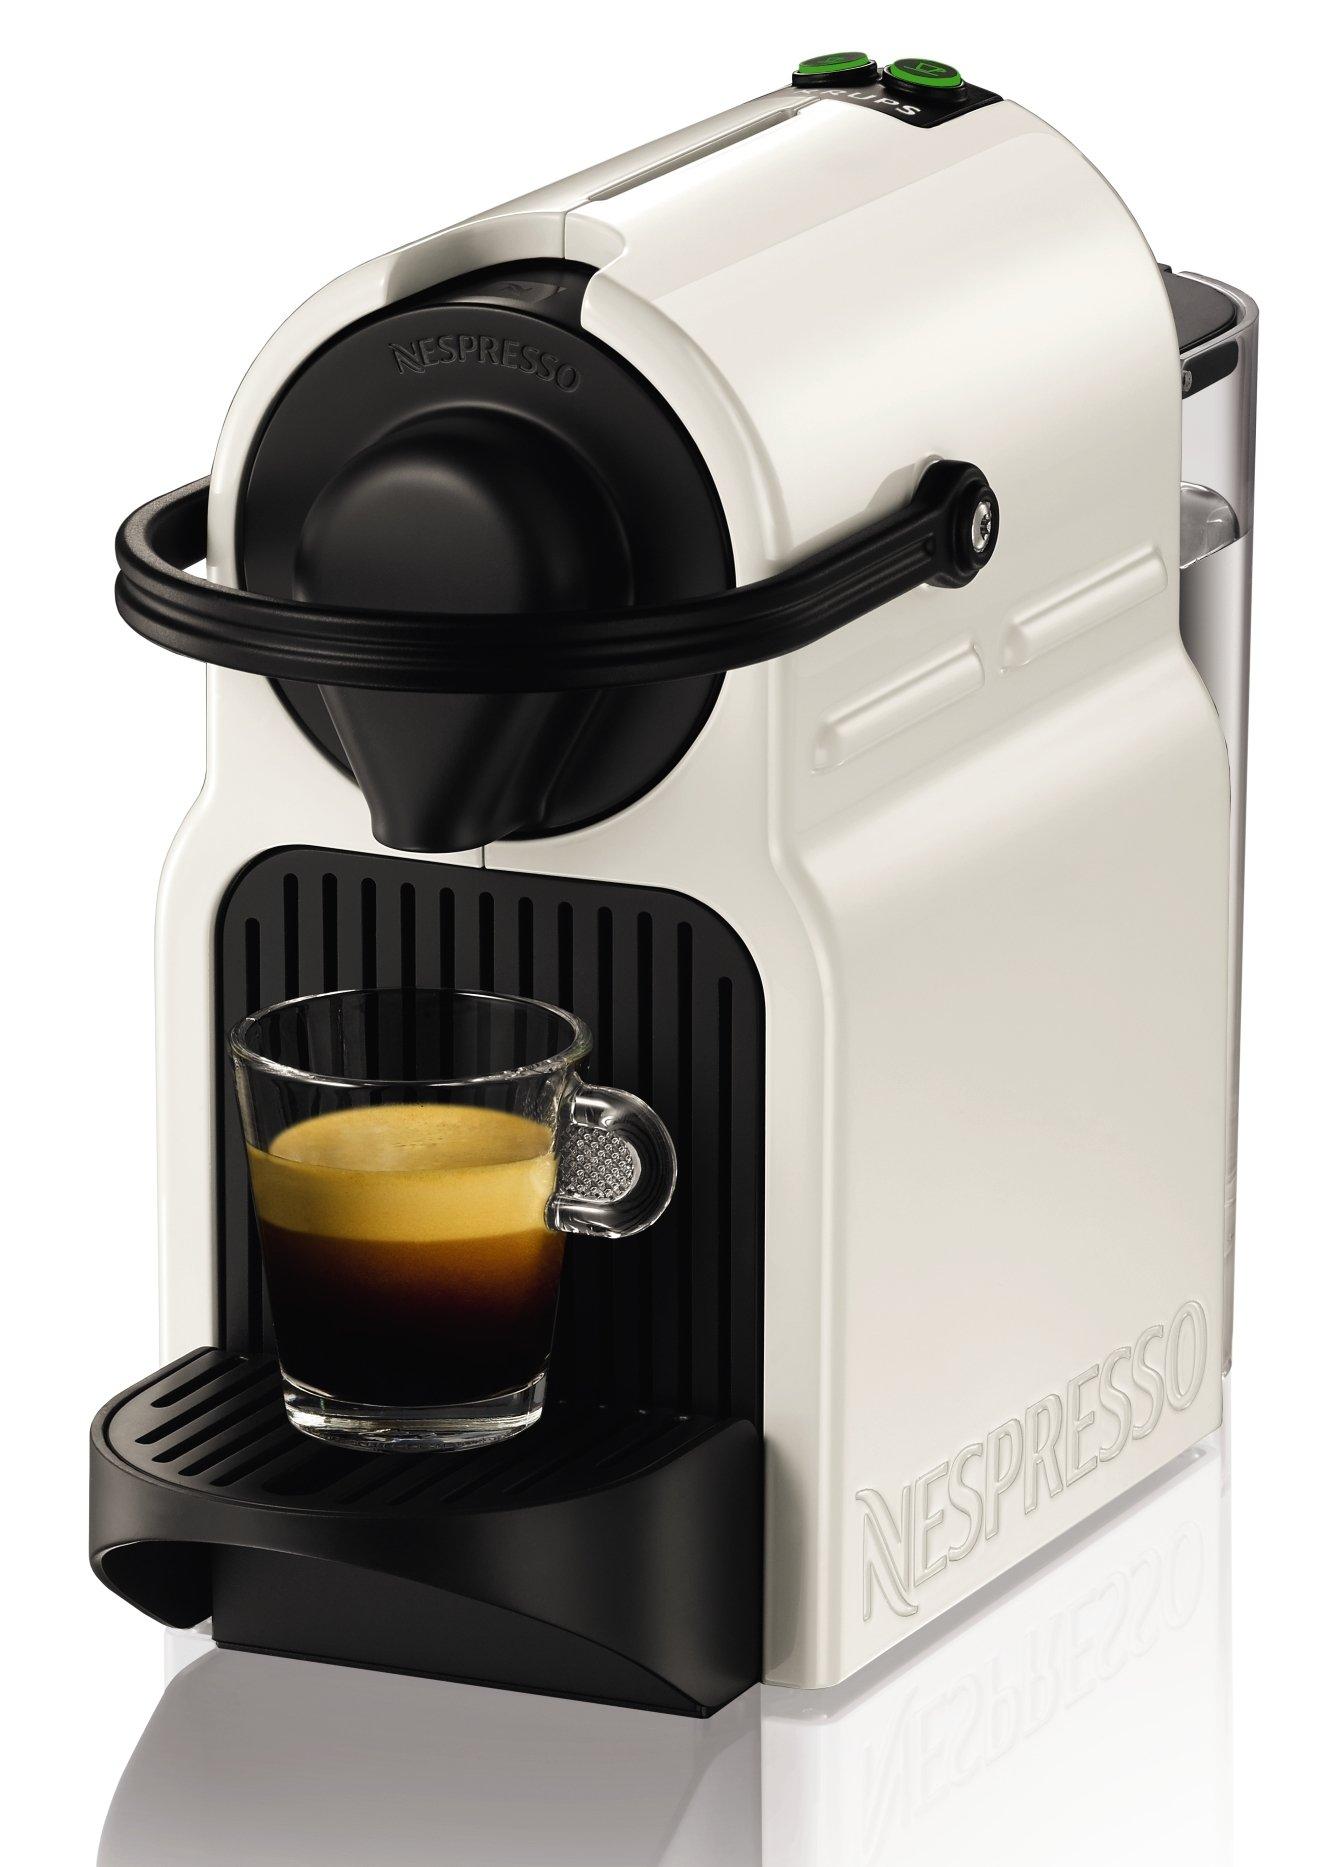 Nespresso Inissia Macchina per caffé espresso, a capsule, 1260 W, 0.7 L, Beige (Vanilla Cream) 1 spesavip